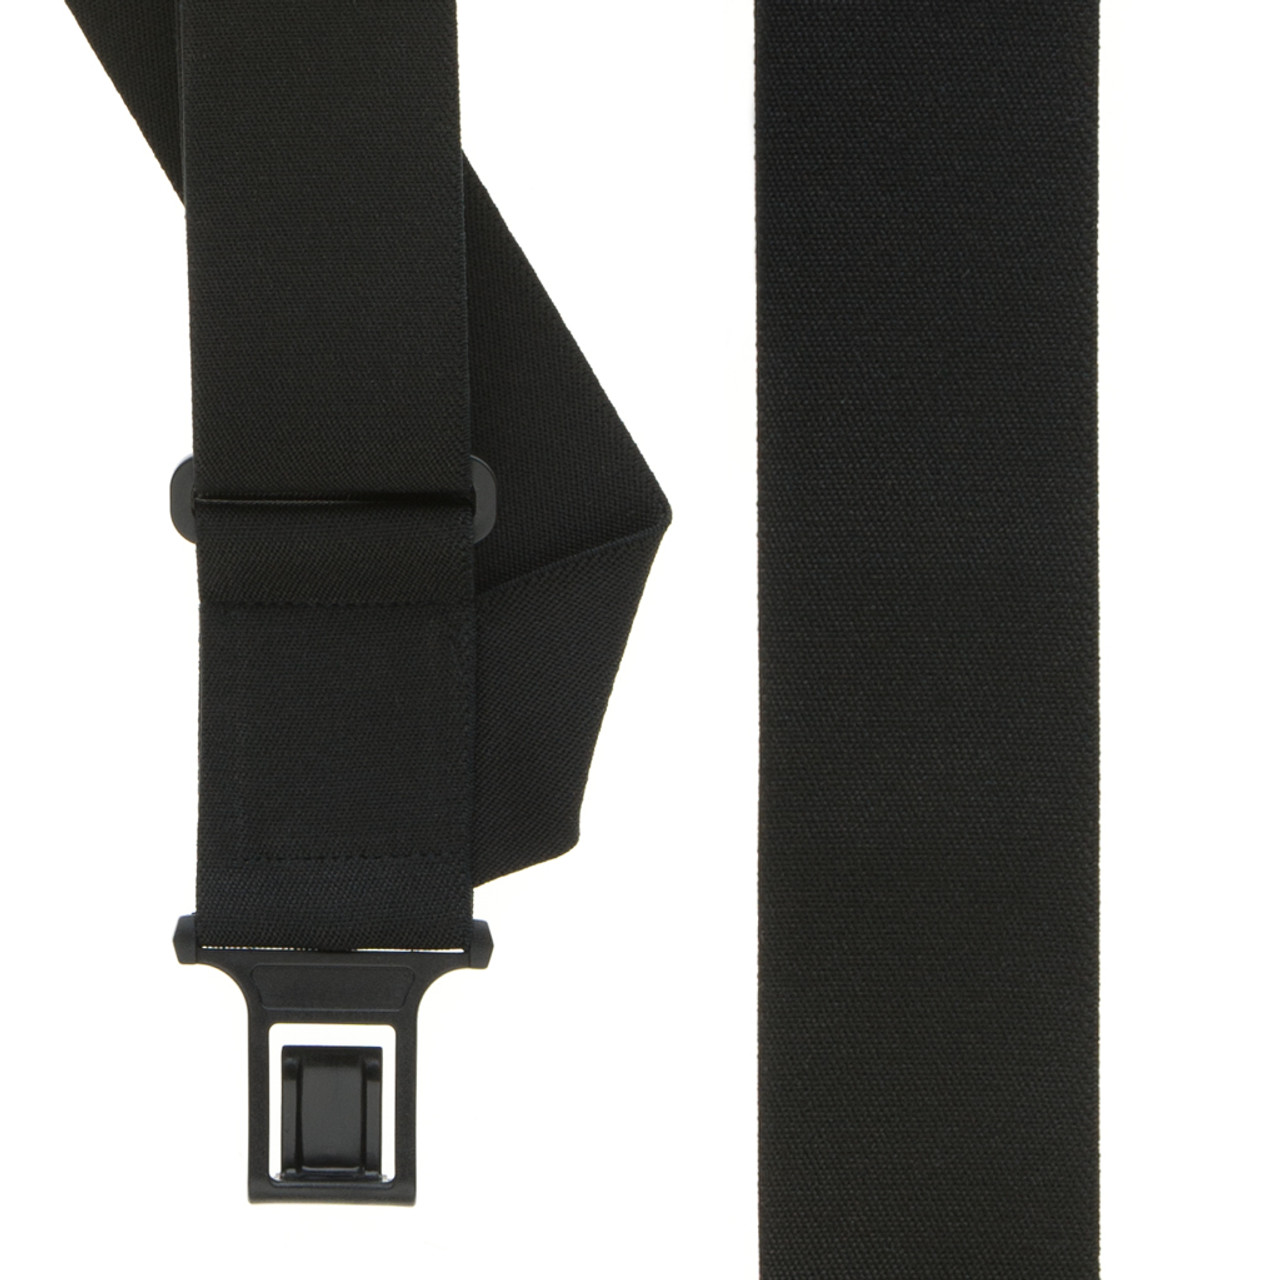 1bdb6b982 Perry Suspenders - Front View - Black Side Clip Elastic